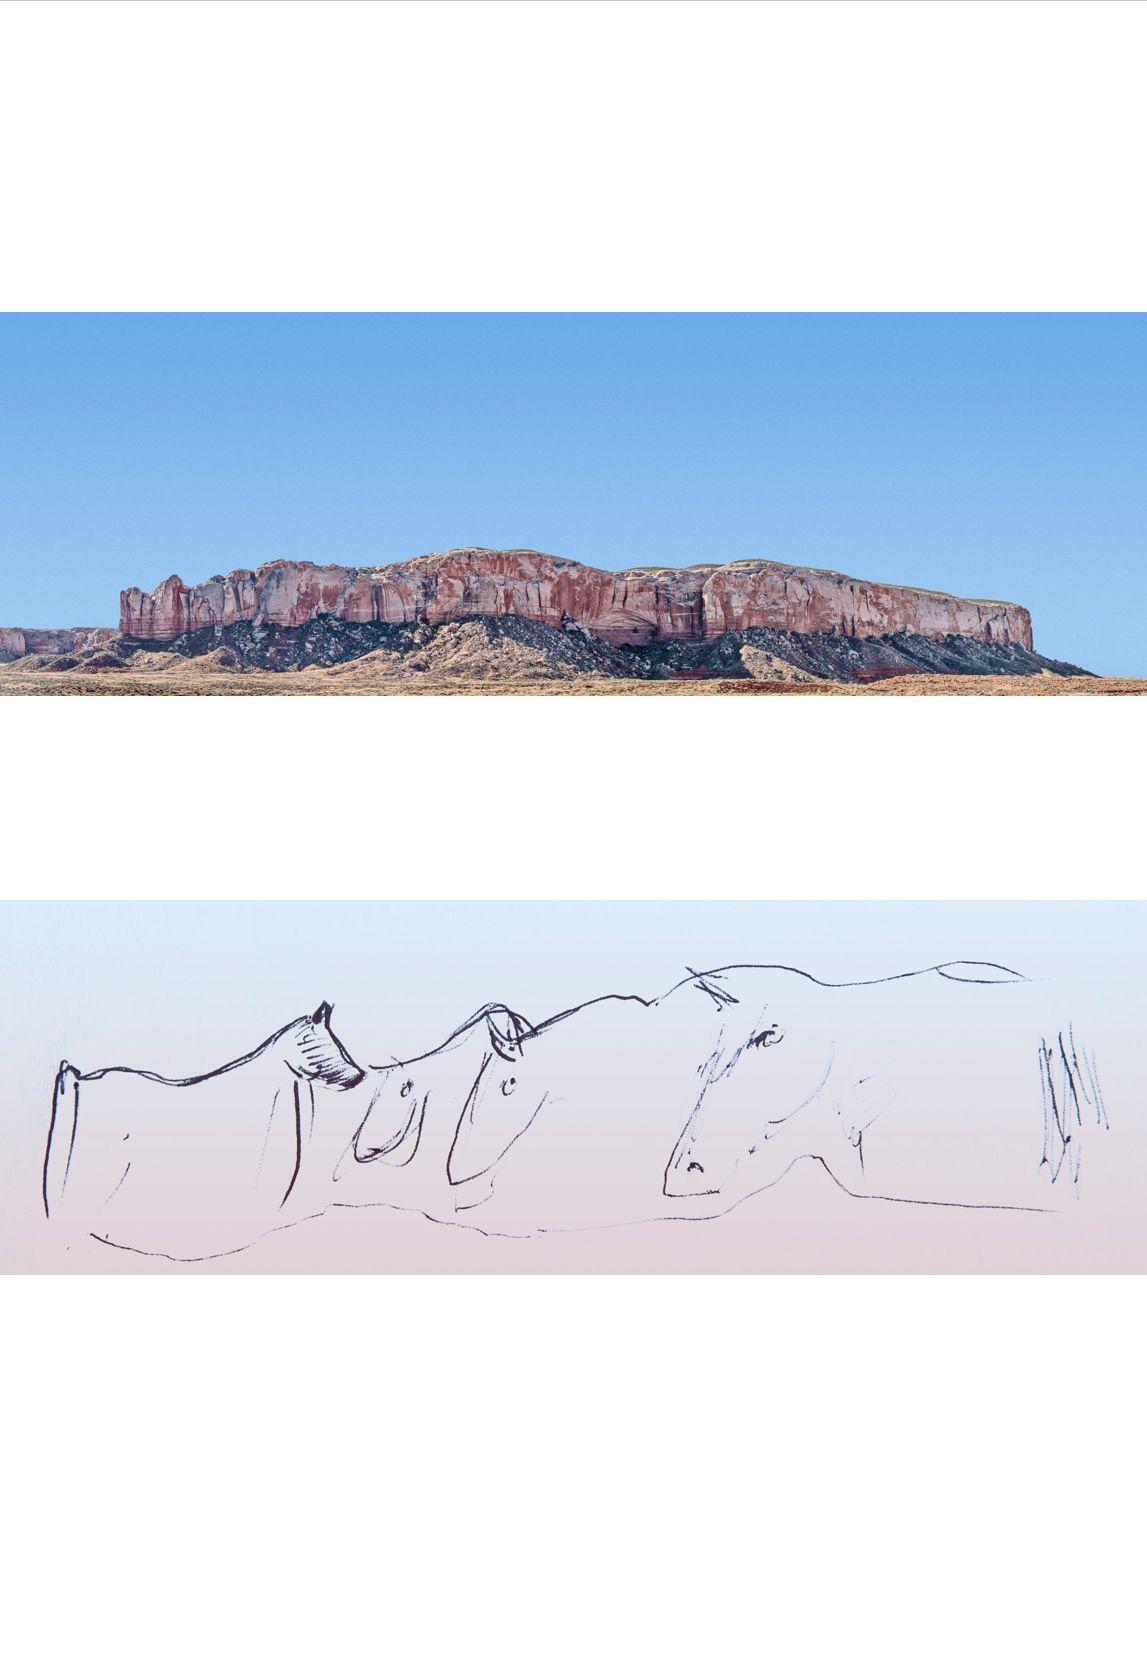 Jonah Yellowman's Mesa   Bears Ears Country